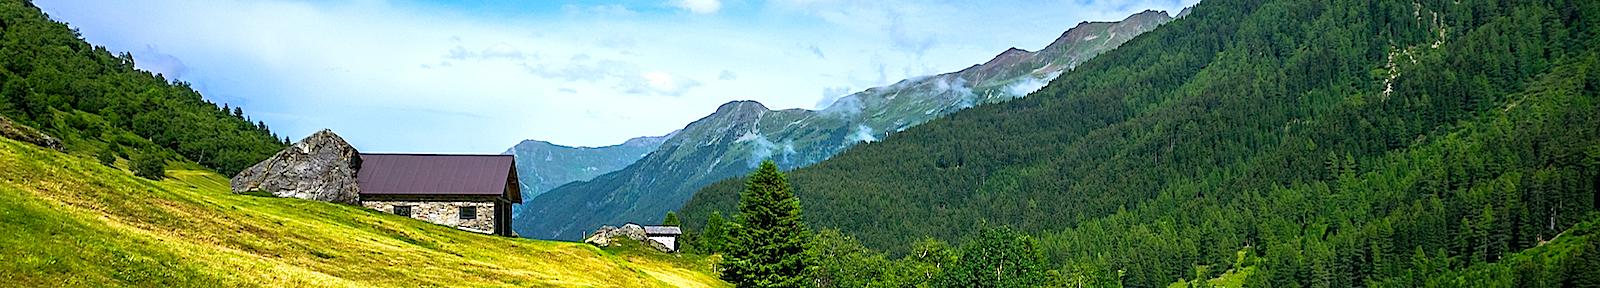 Православная Австрия